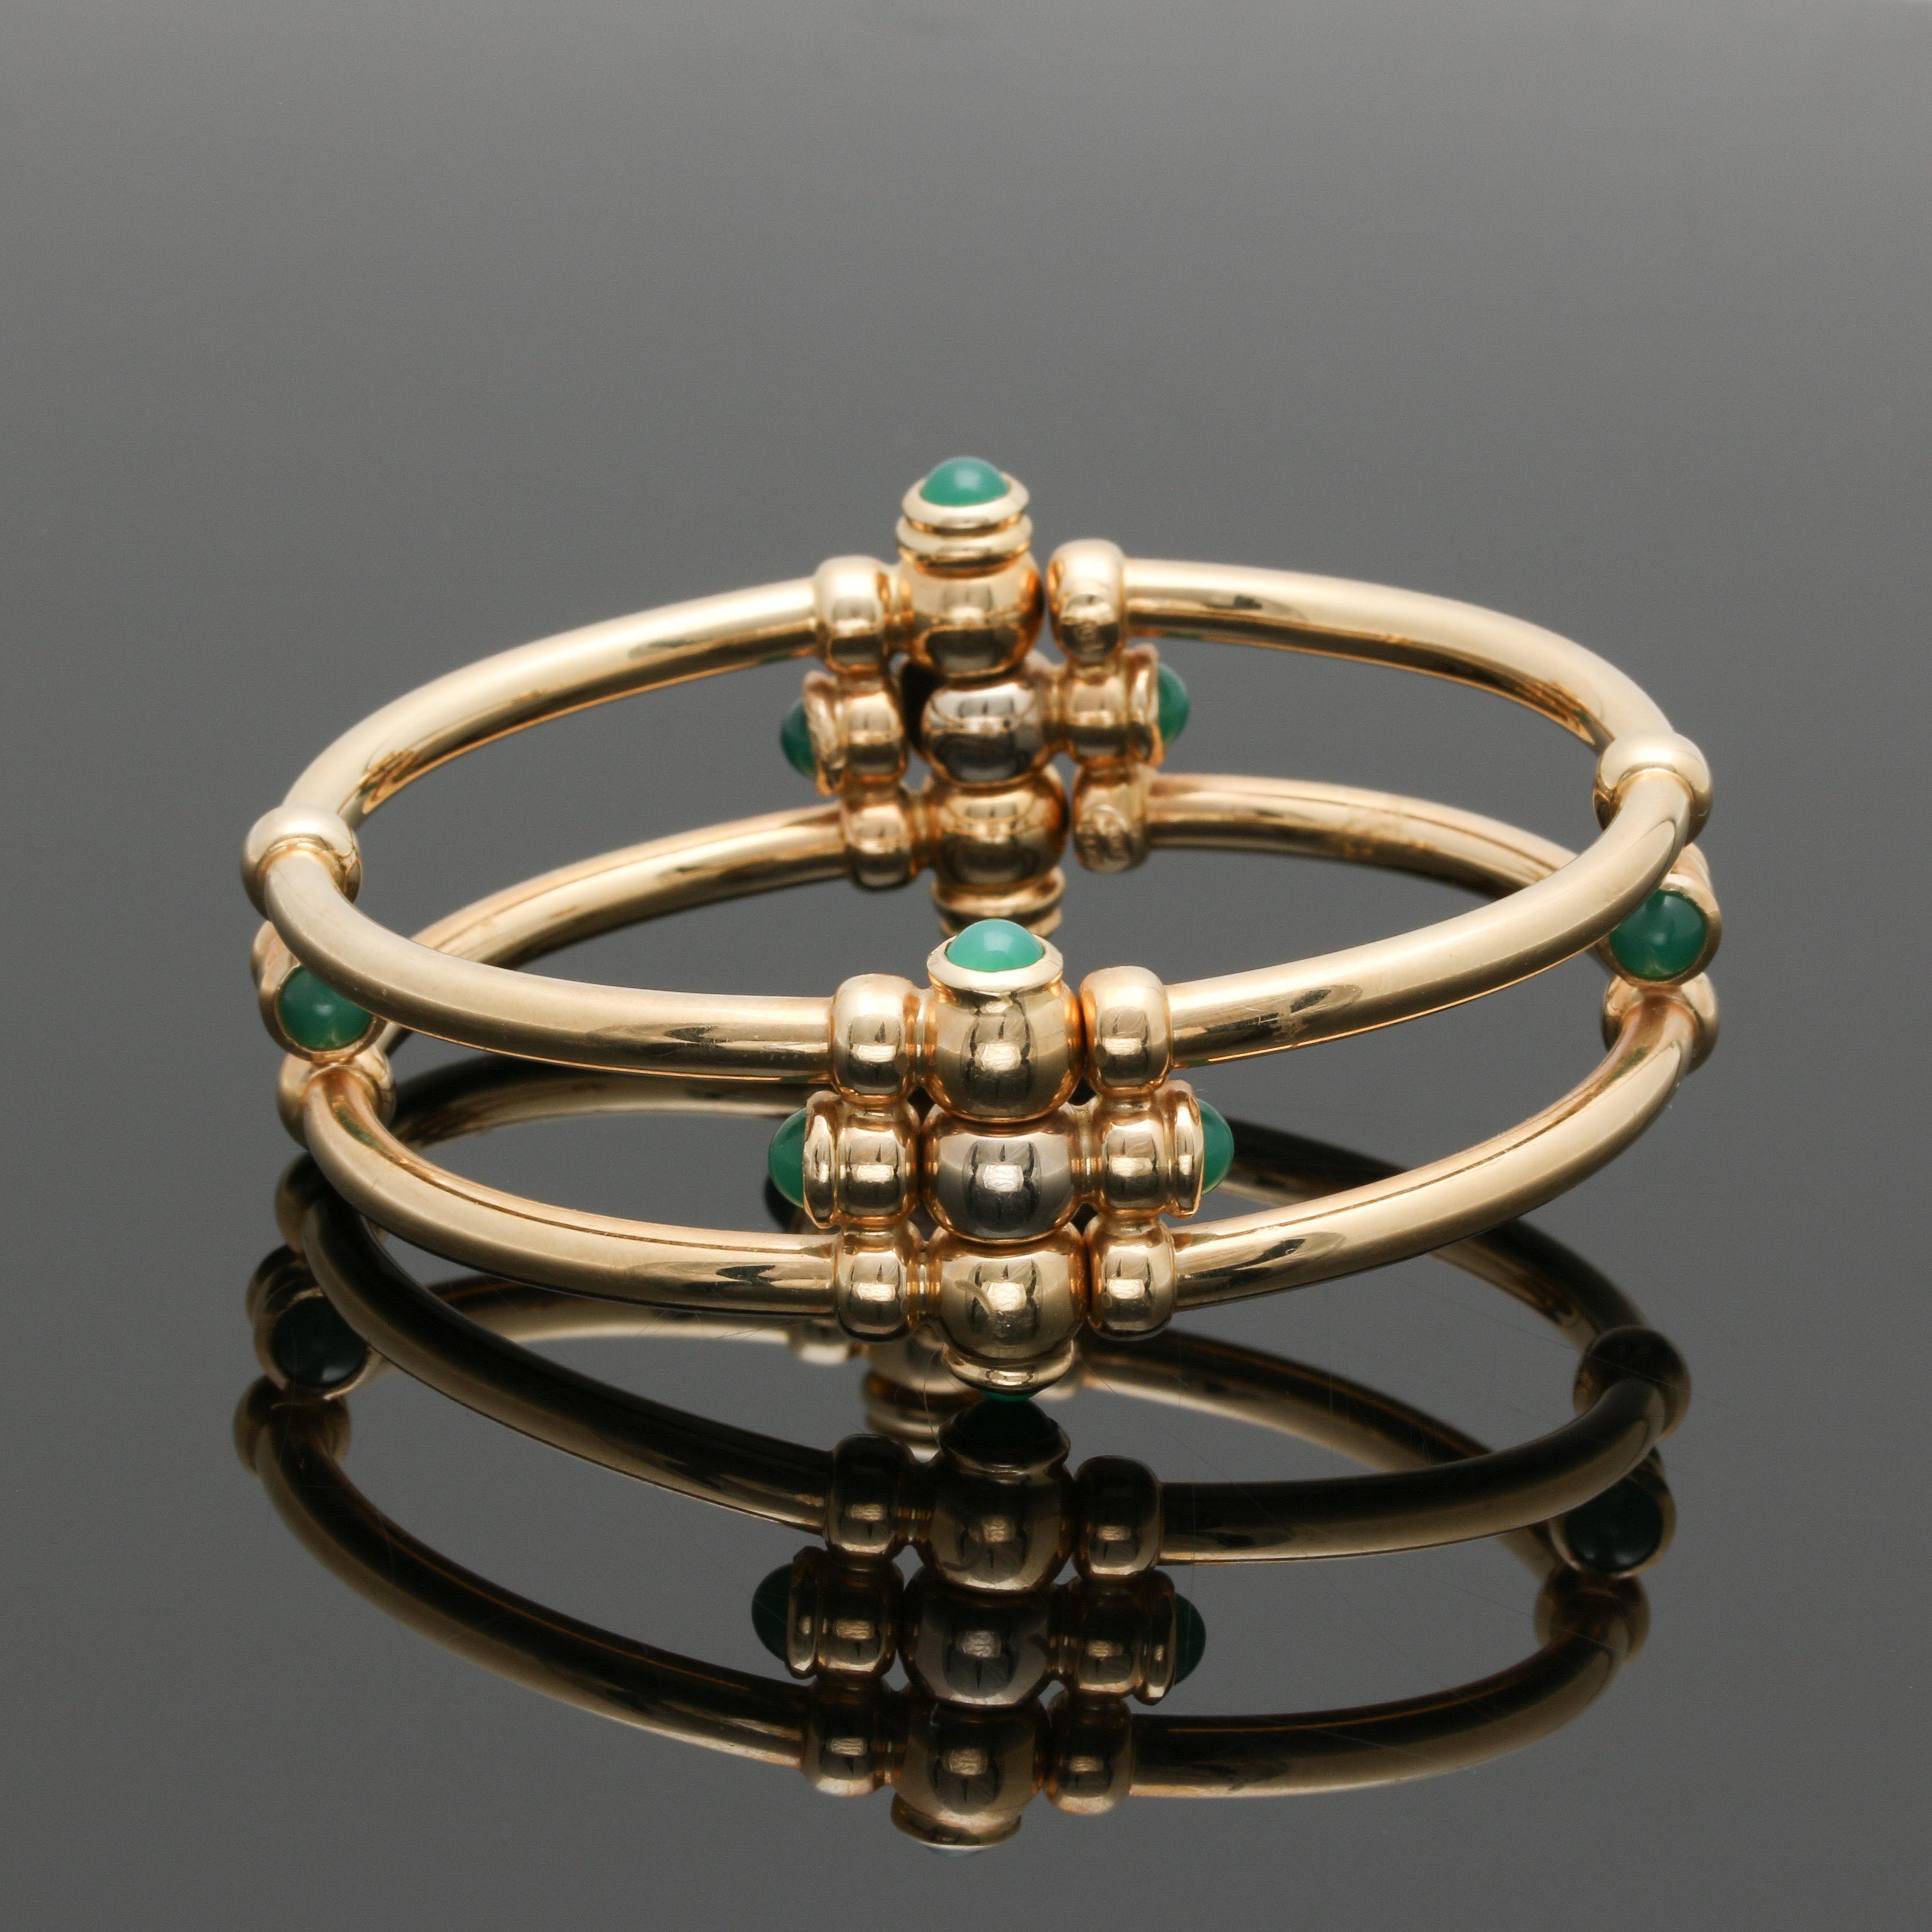 14K Yellow Gold Green Chalcedony Hinged Bangle Bracelet